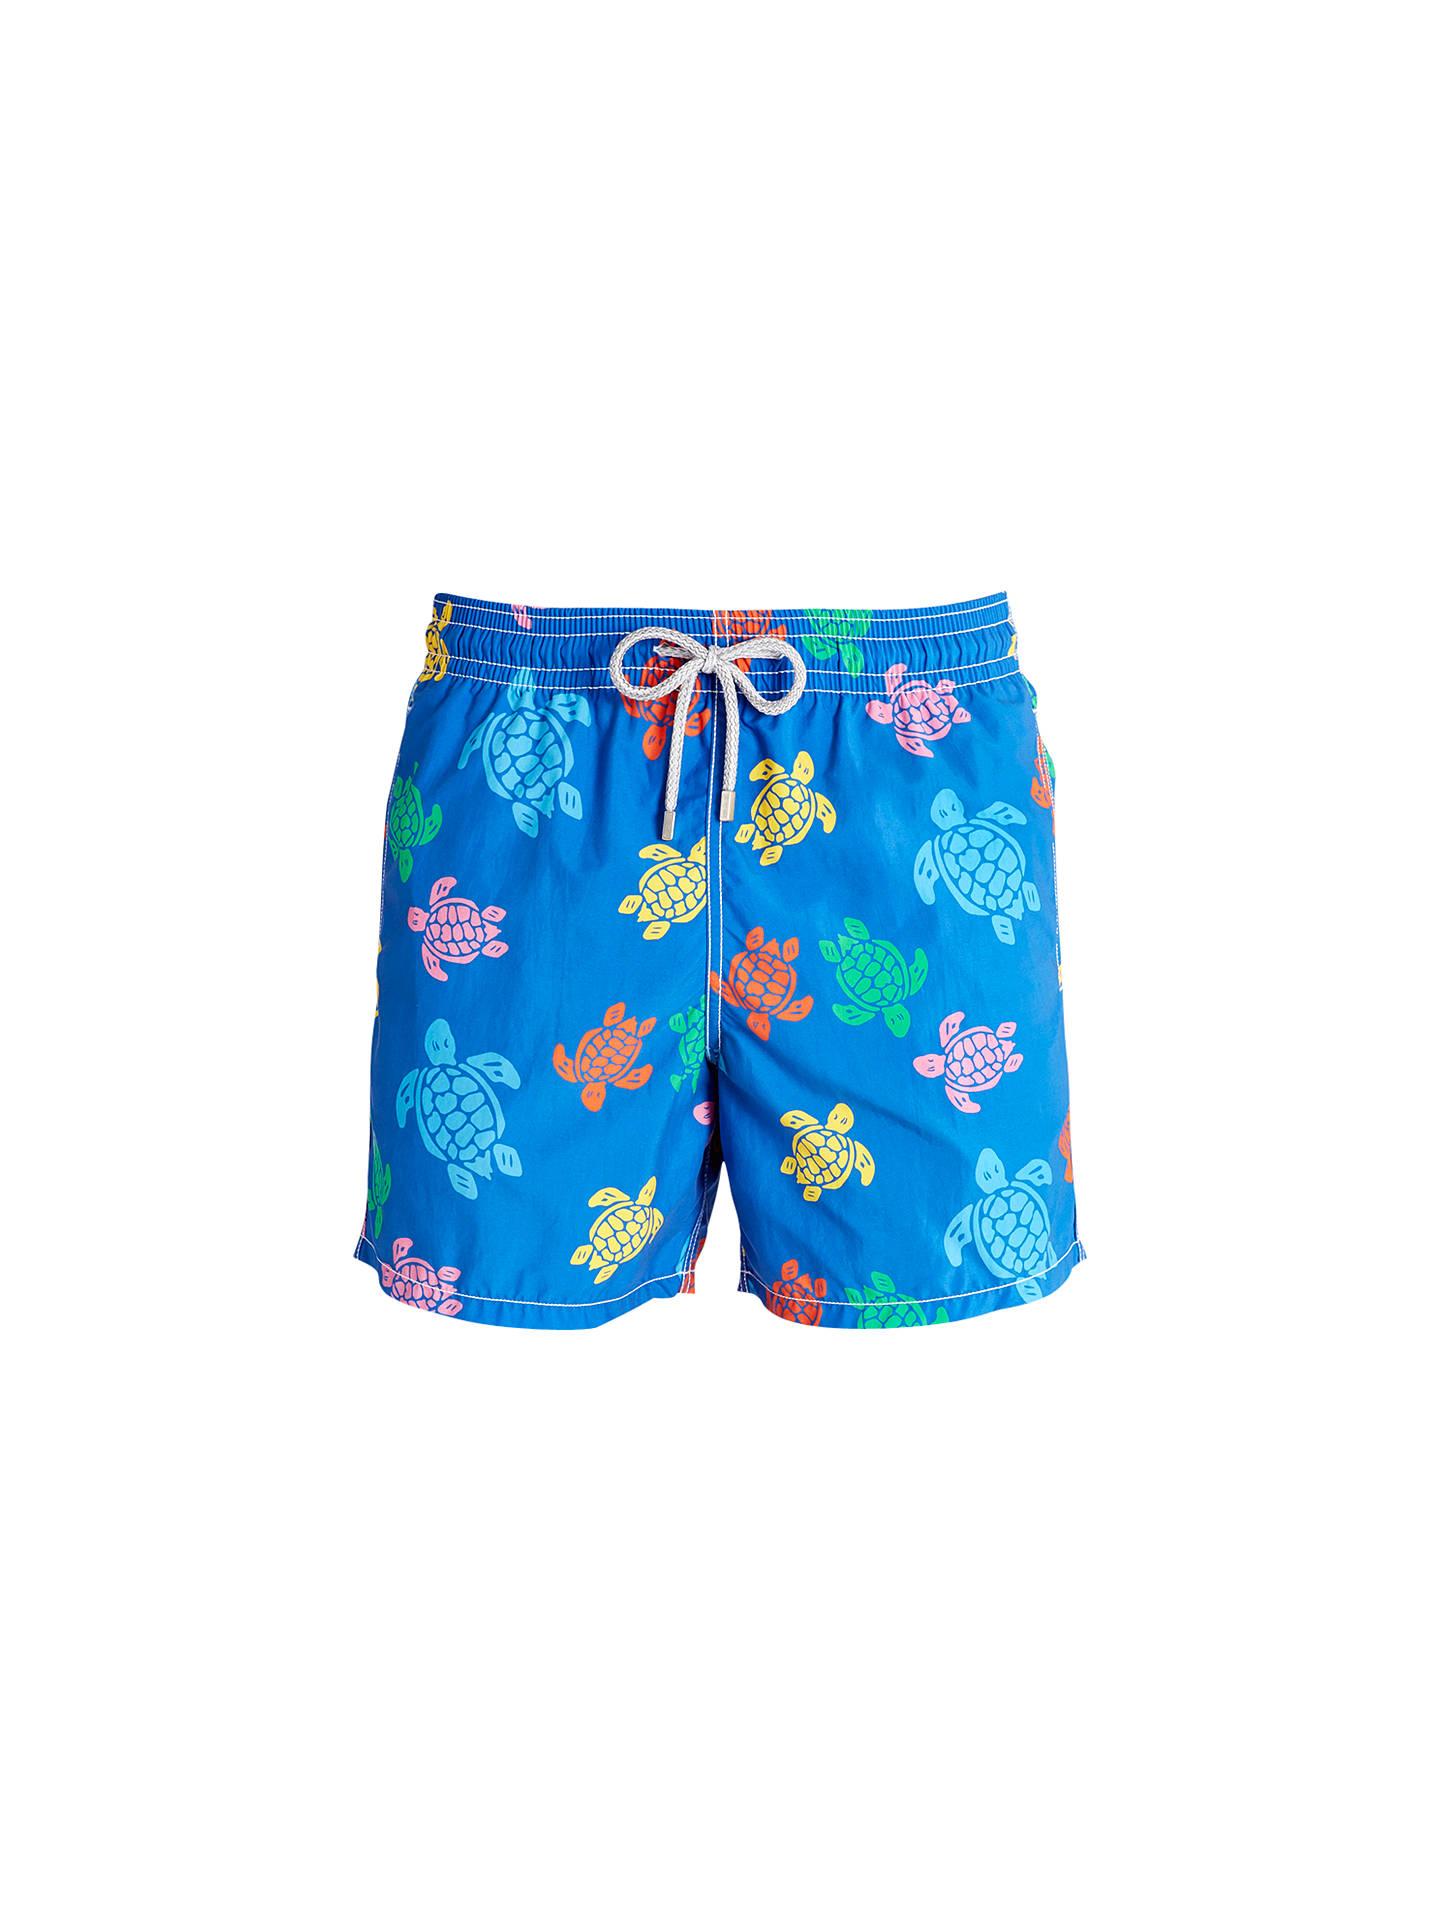 f3eaa4f40b Buy Vilebrequin Moorea Multi-Coloured Turtle Print Swim Shorts, Blue, S  Online at